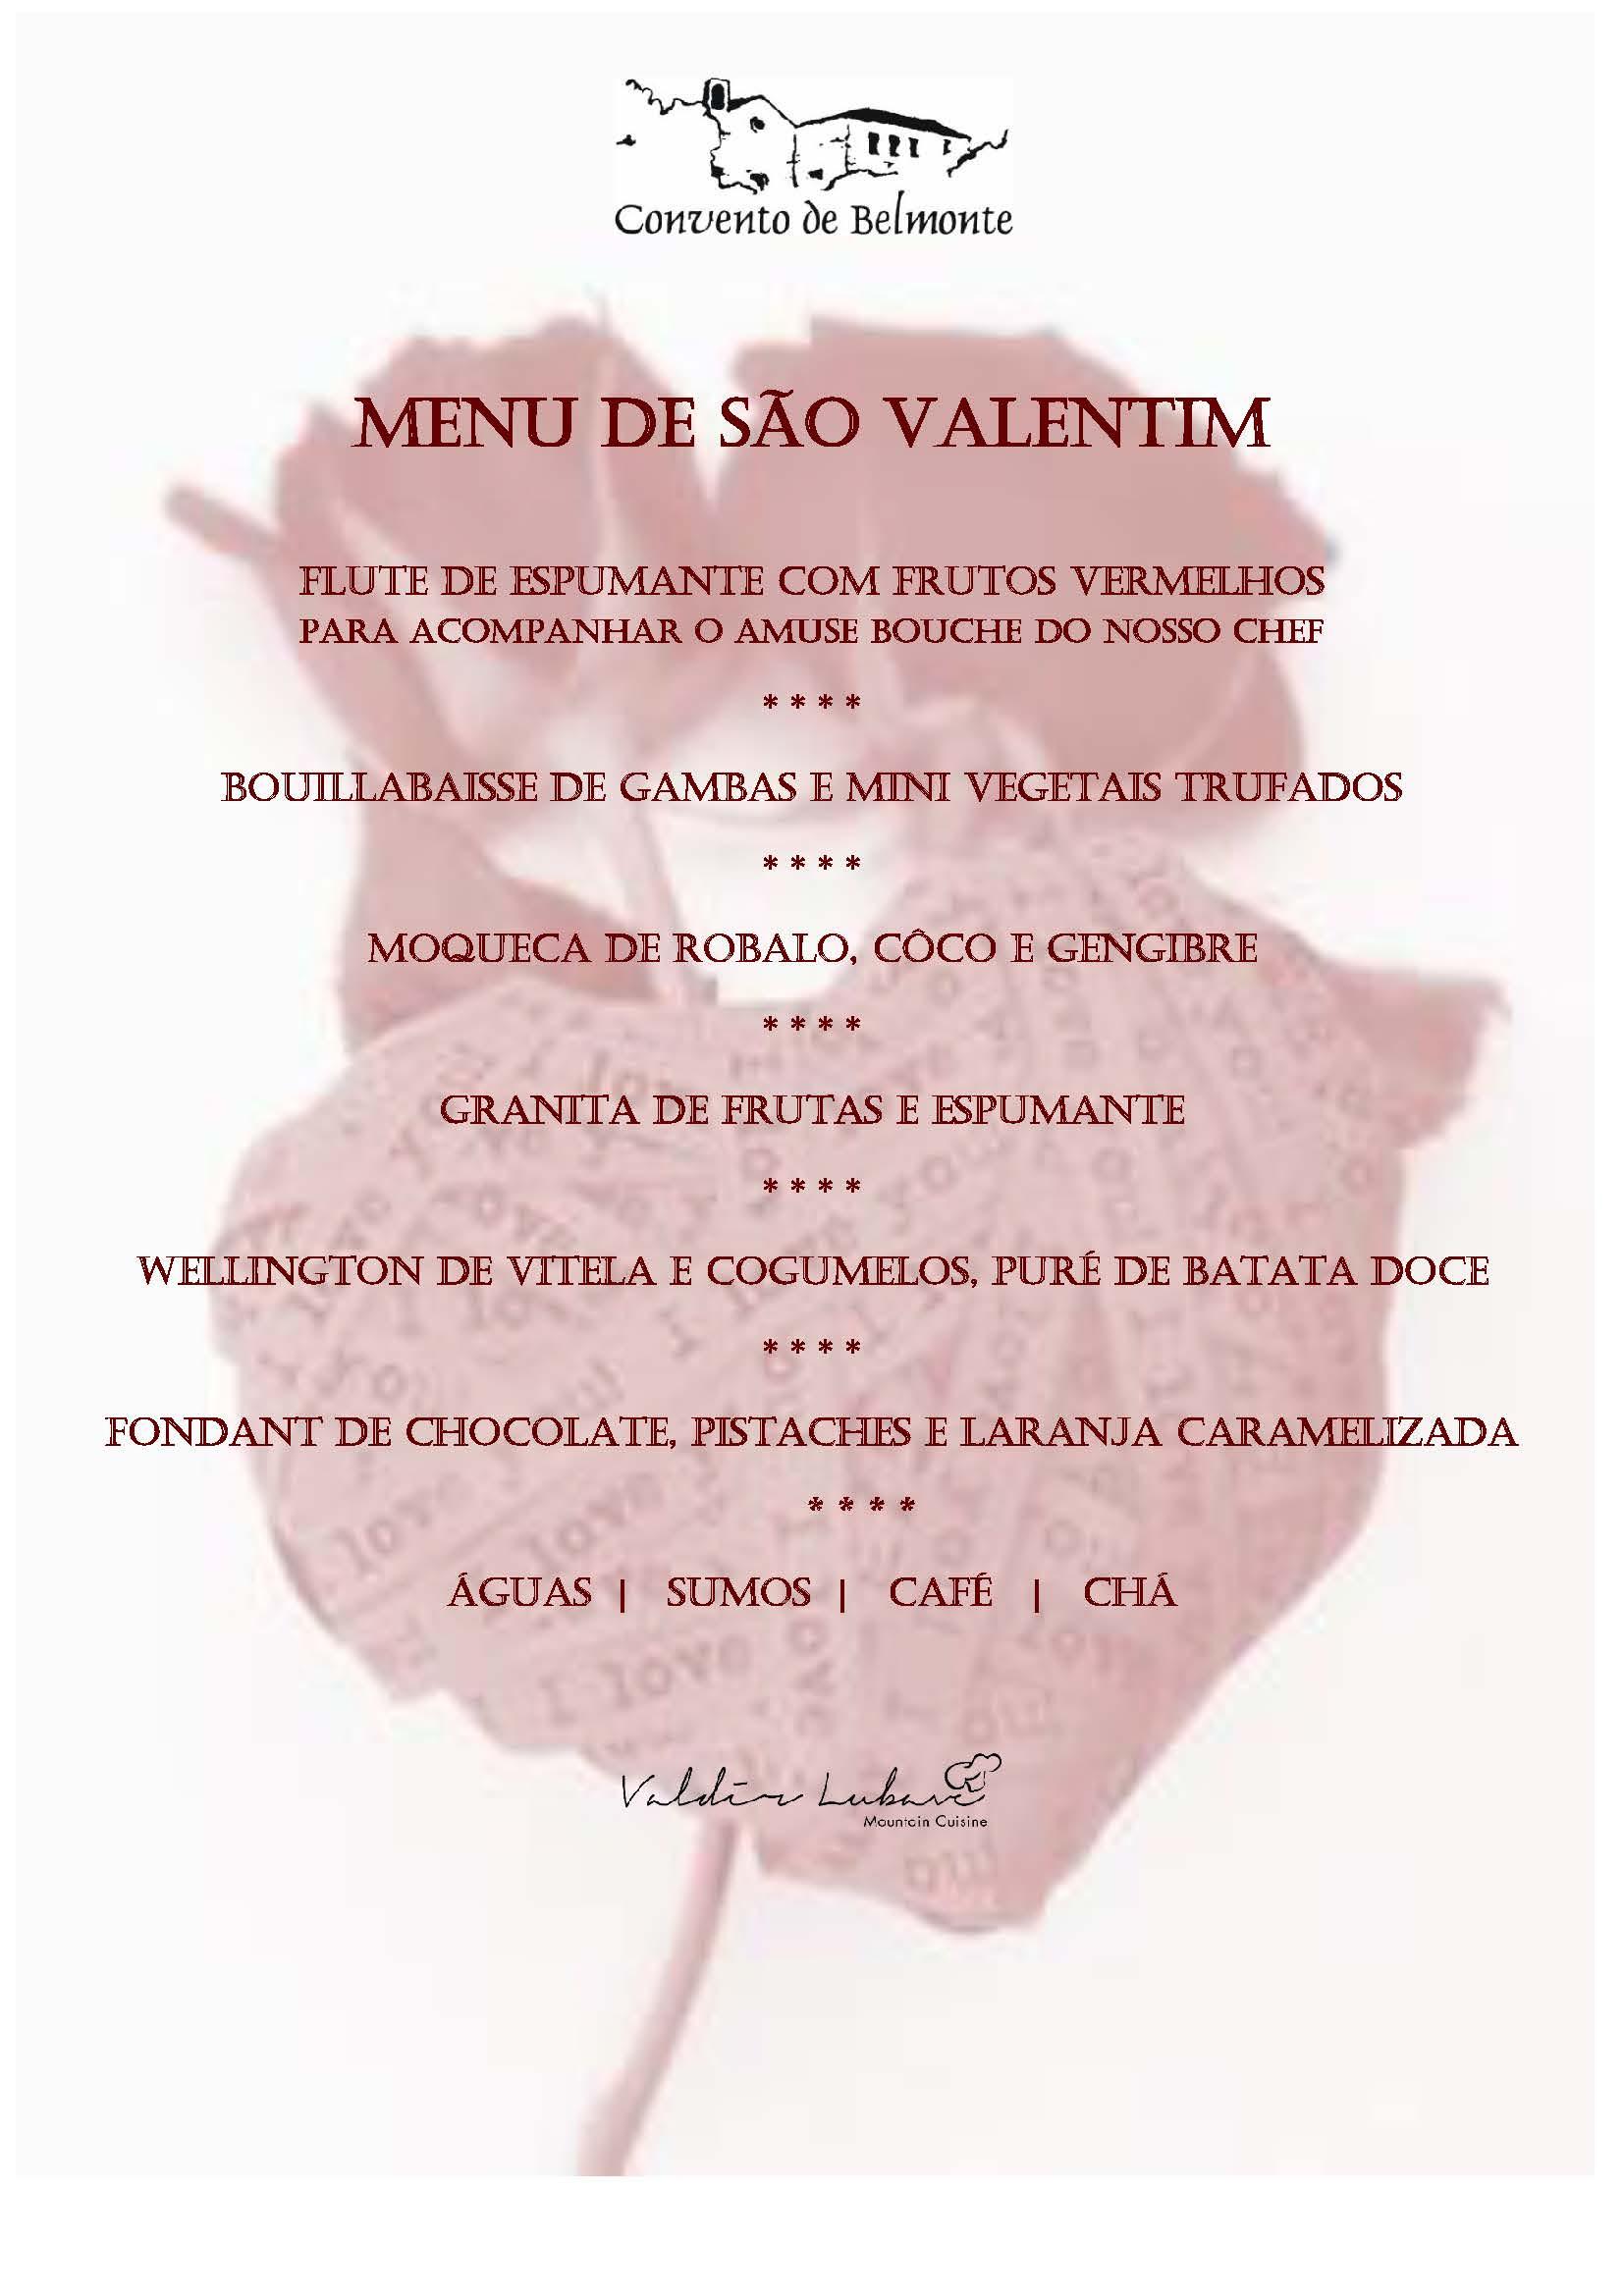 menu-s-valentim-2019-fbk